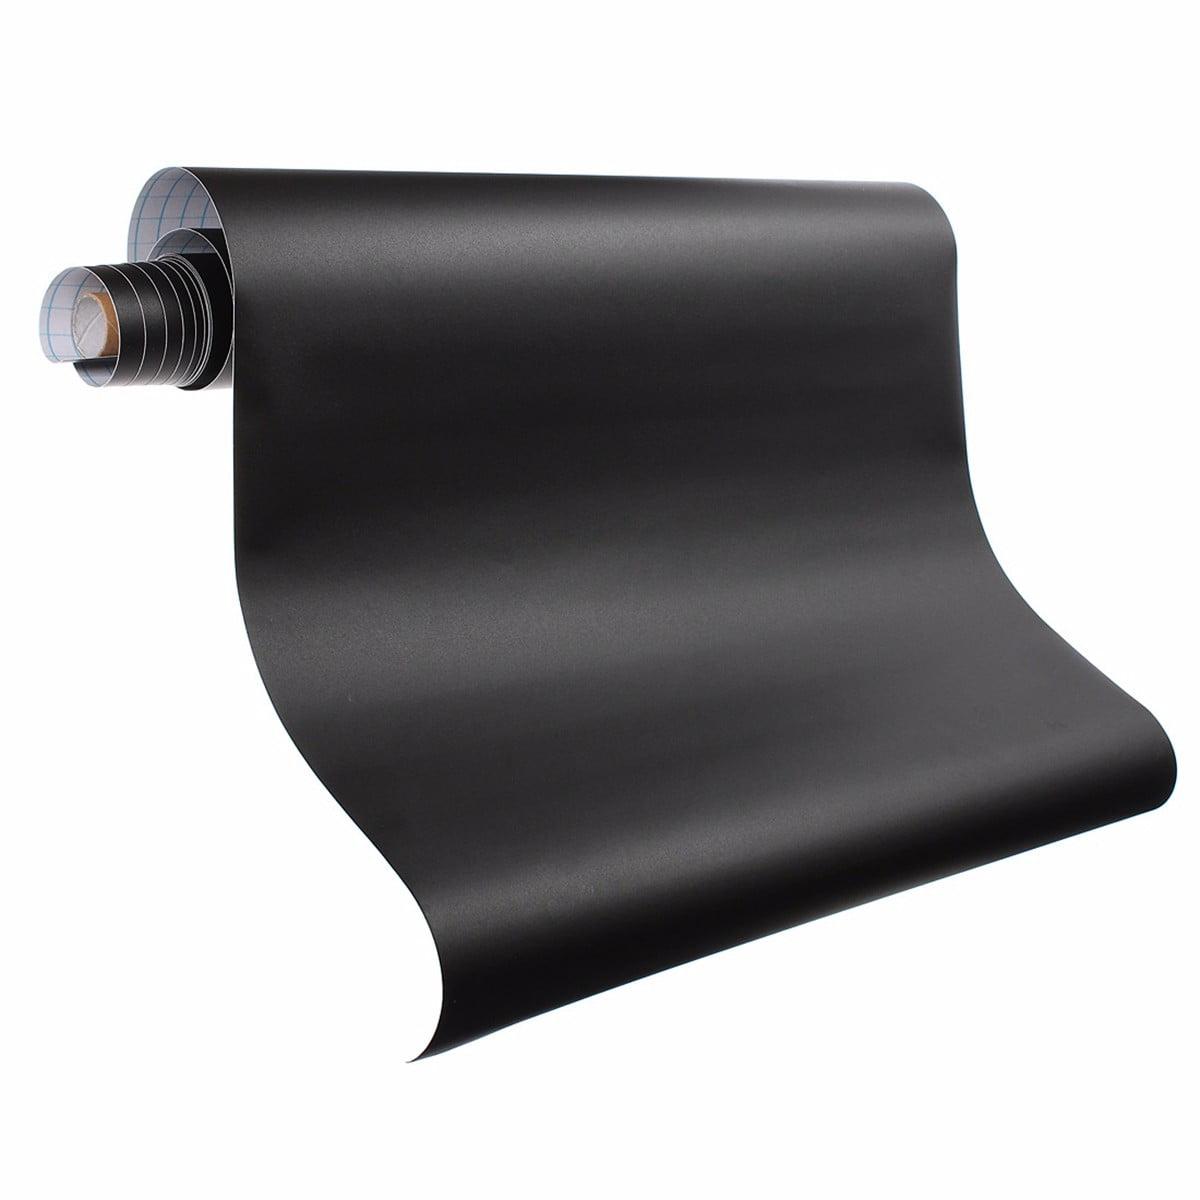 200 x 45cm Vinyl Blackboard Sticker Self Adhesive Wall Sticker Chalkboard Wall Paper Contact Paper For School... by